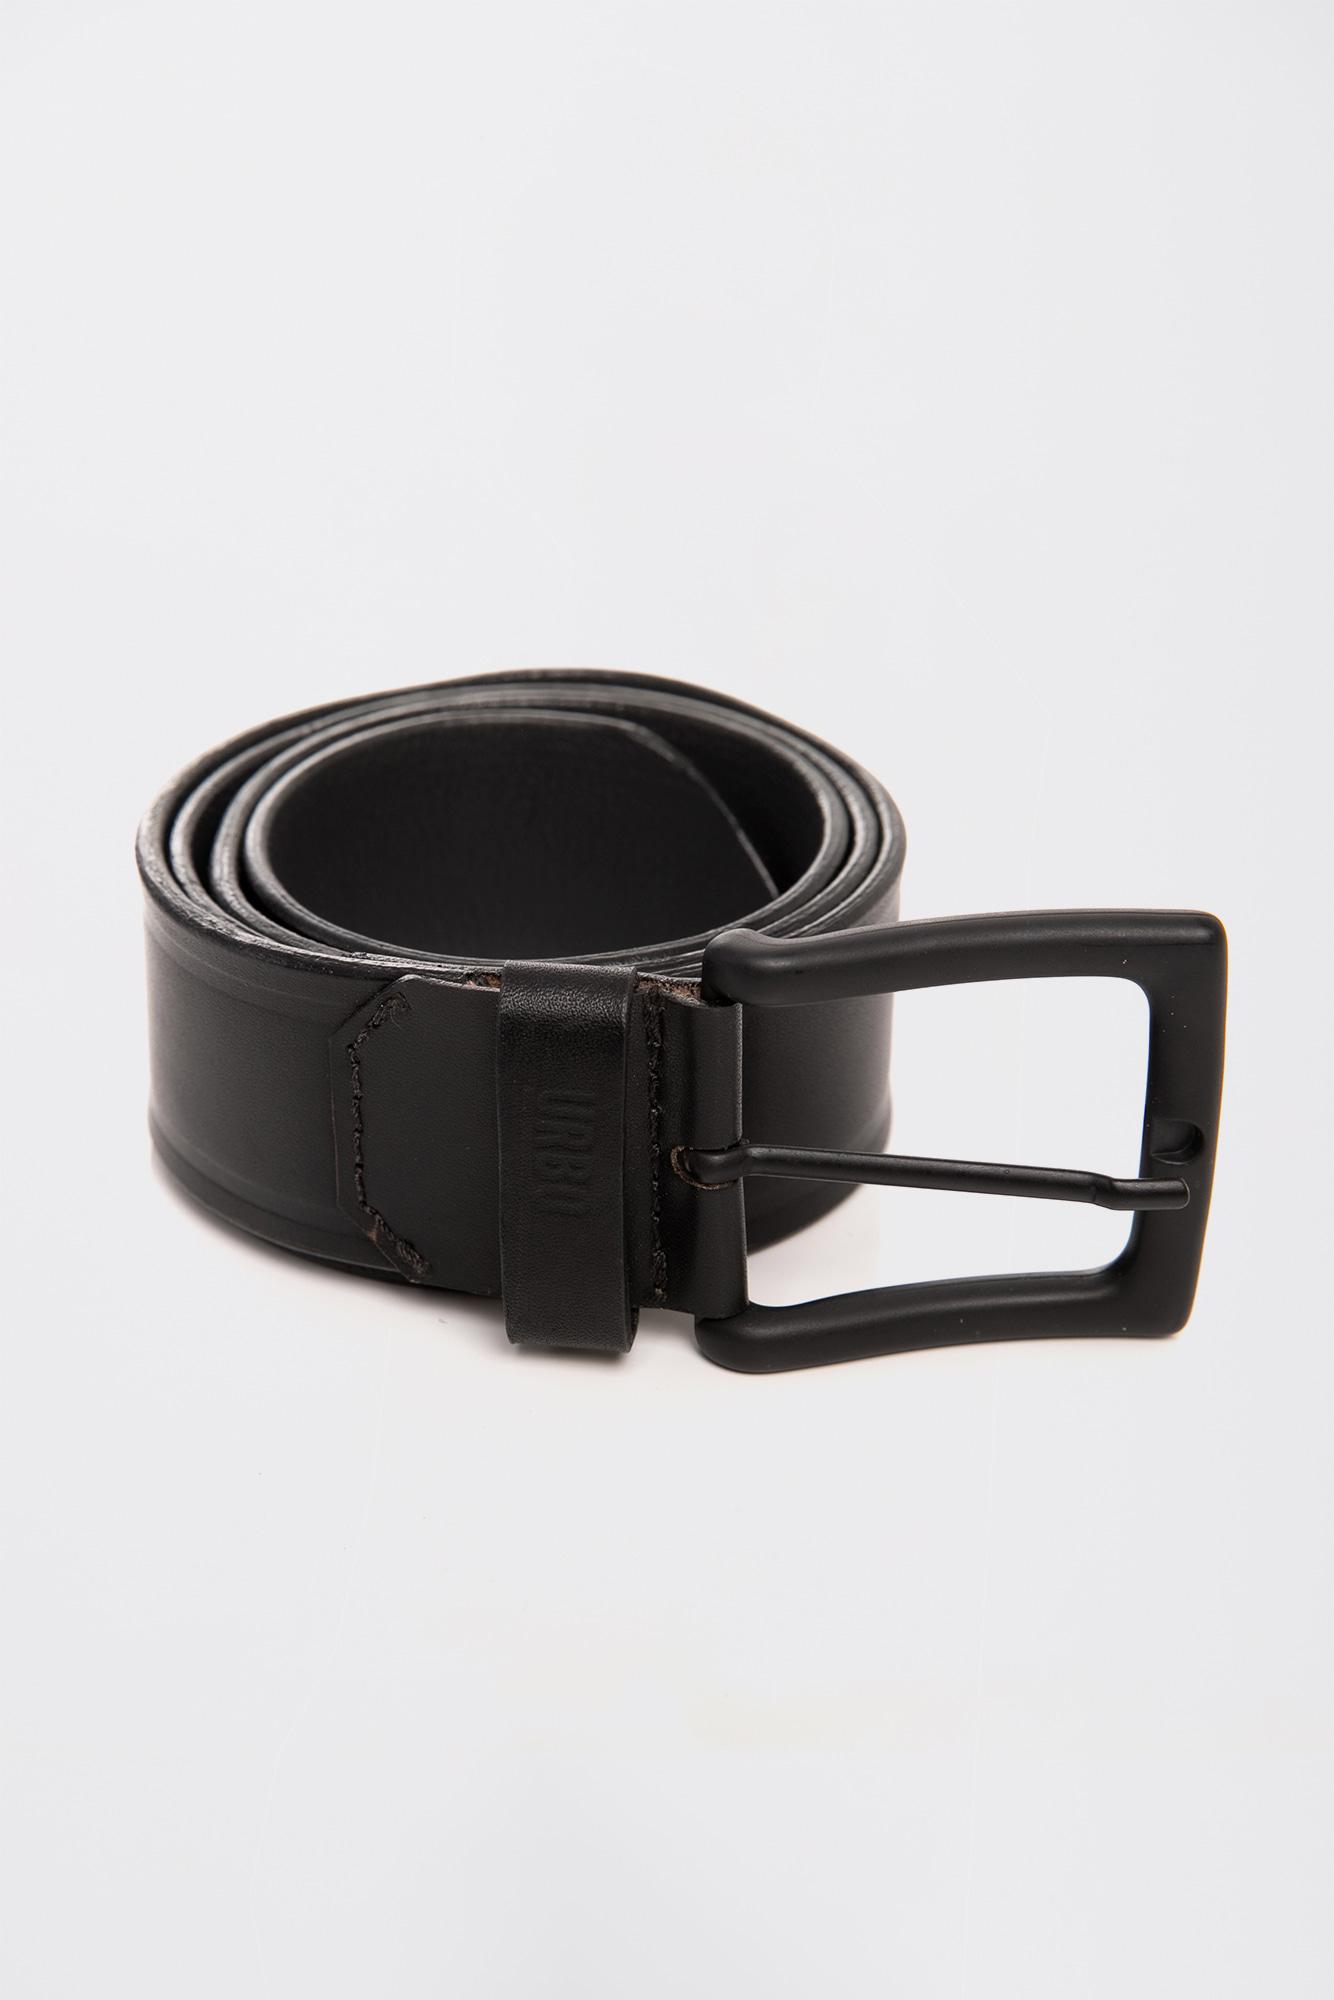 Cinto Leather Black